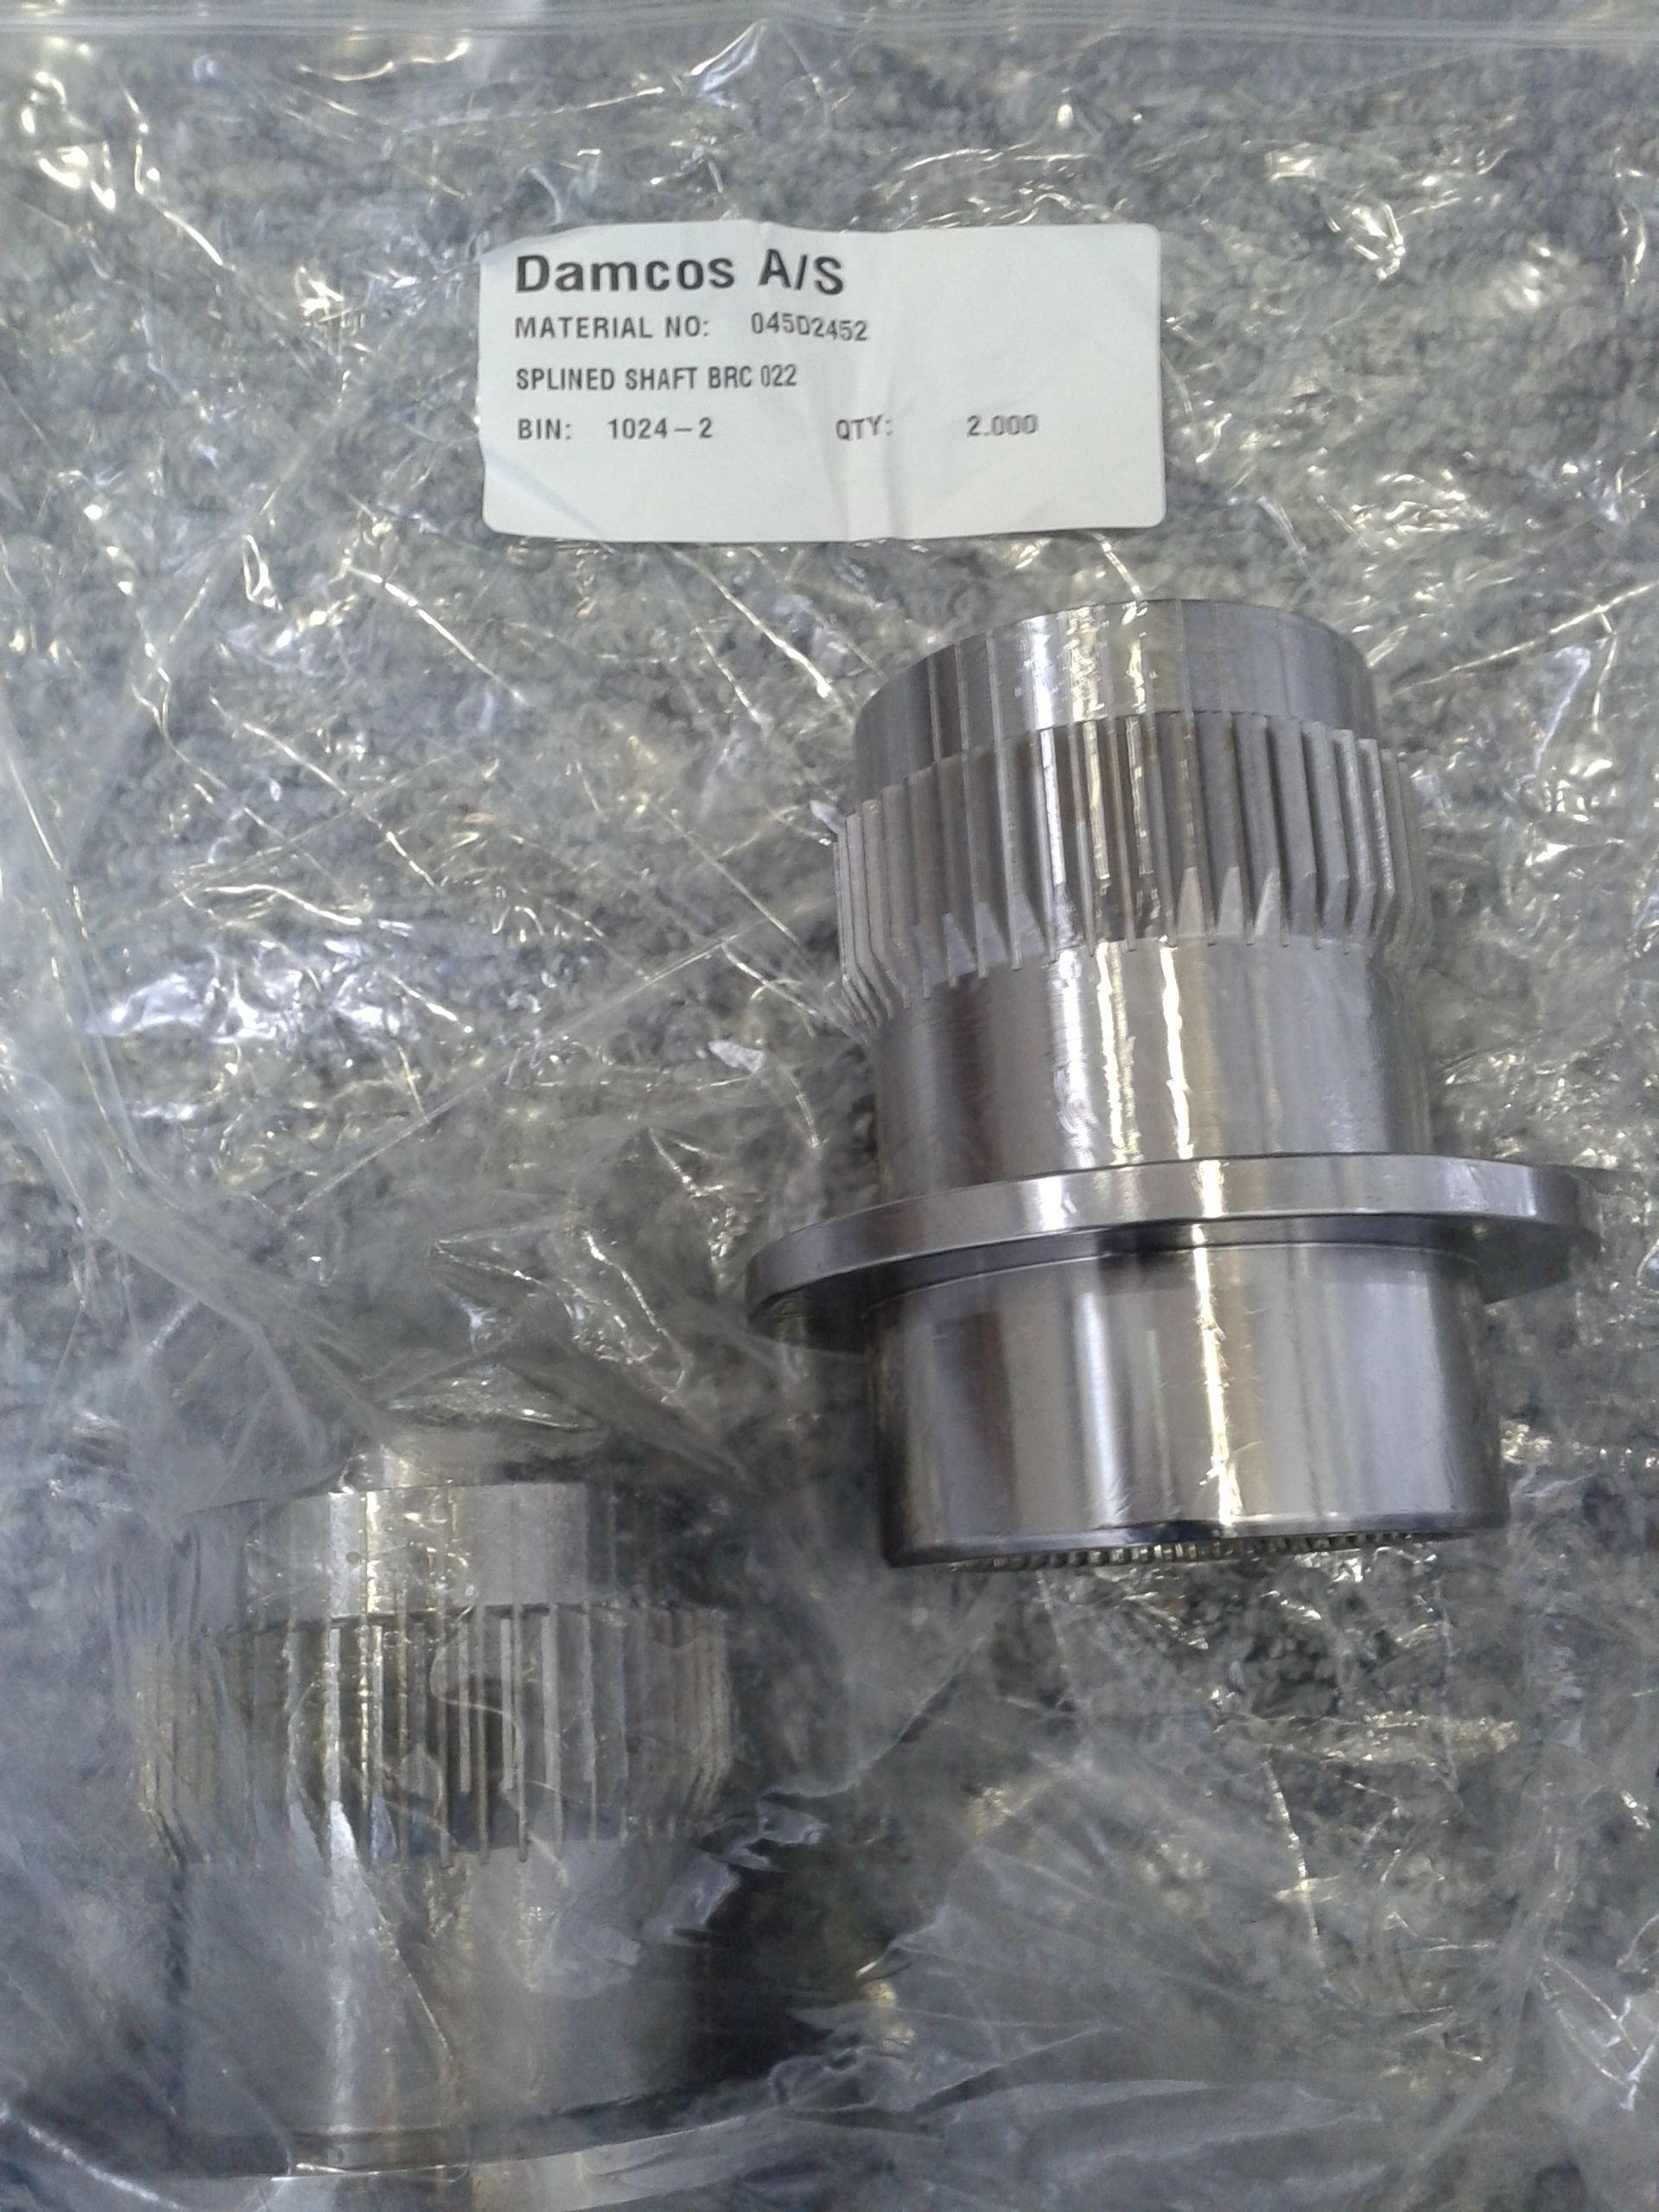 Damcos-BRC-022-A1-Output-Shaft-Part-045D2452